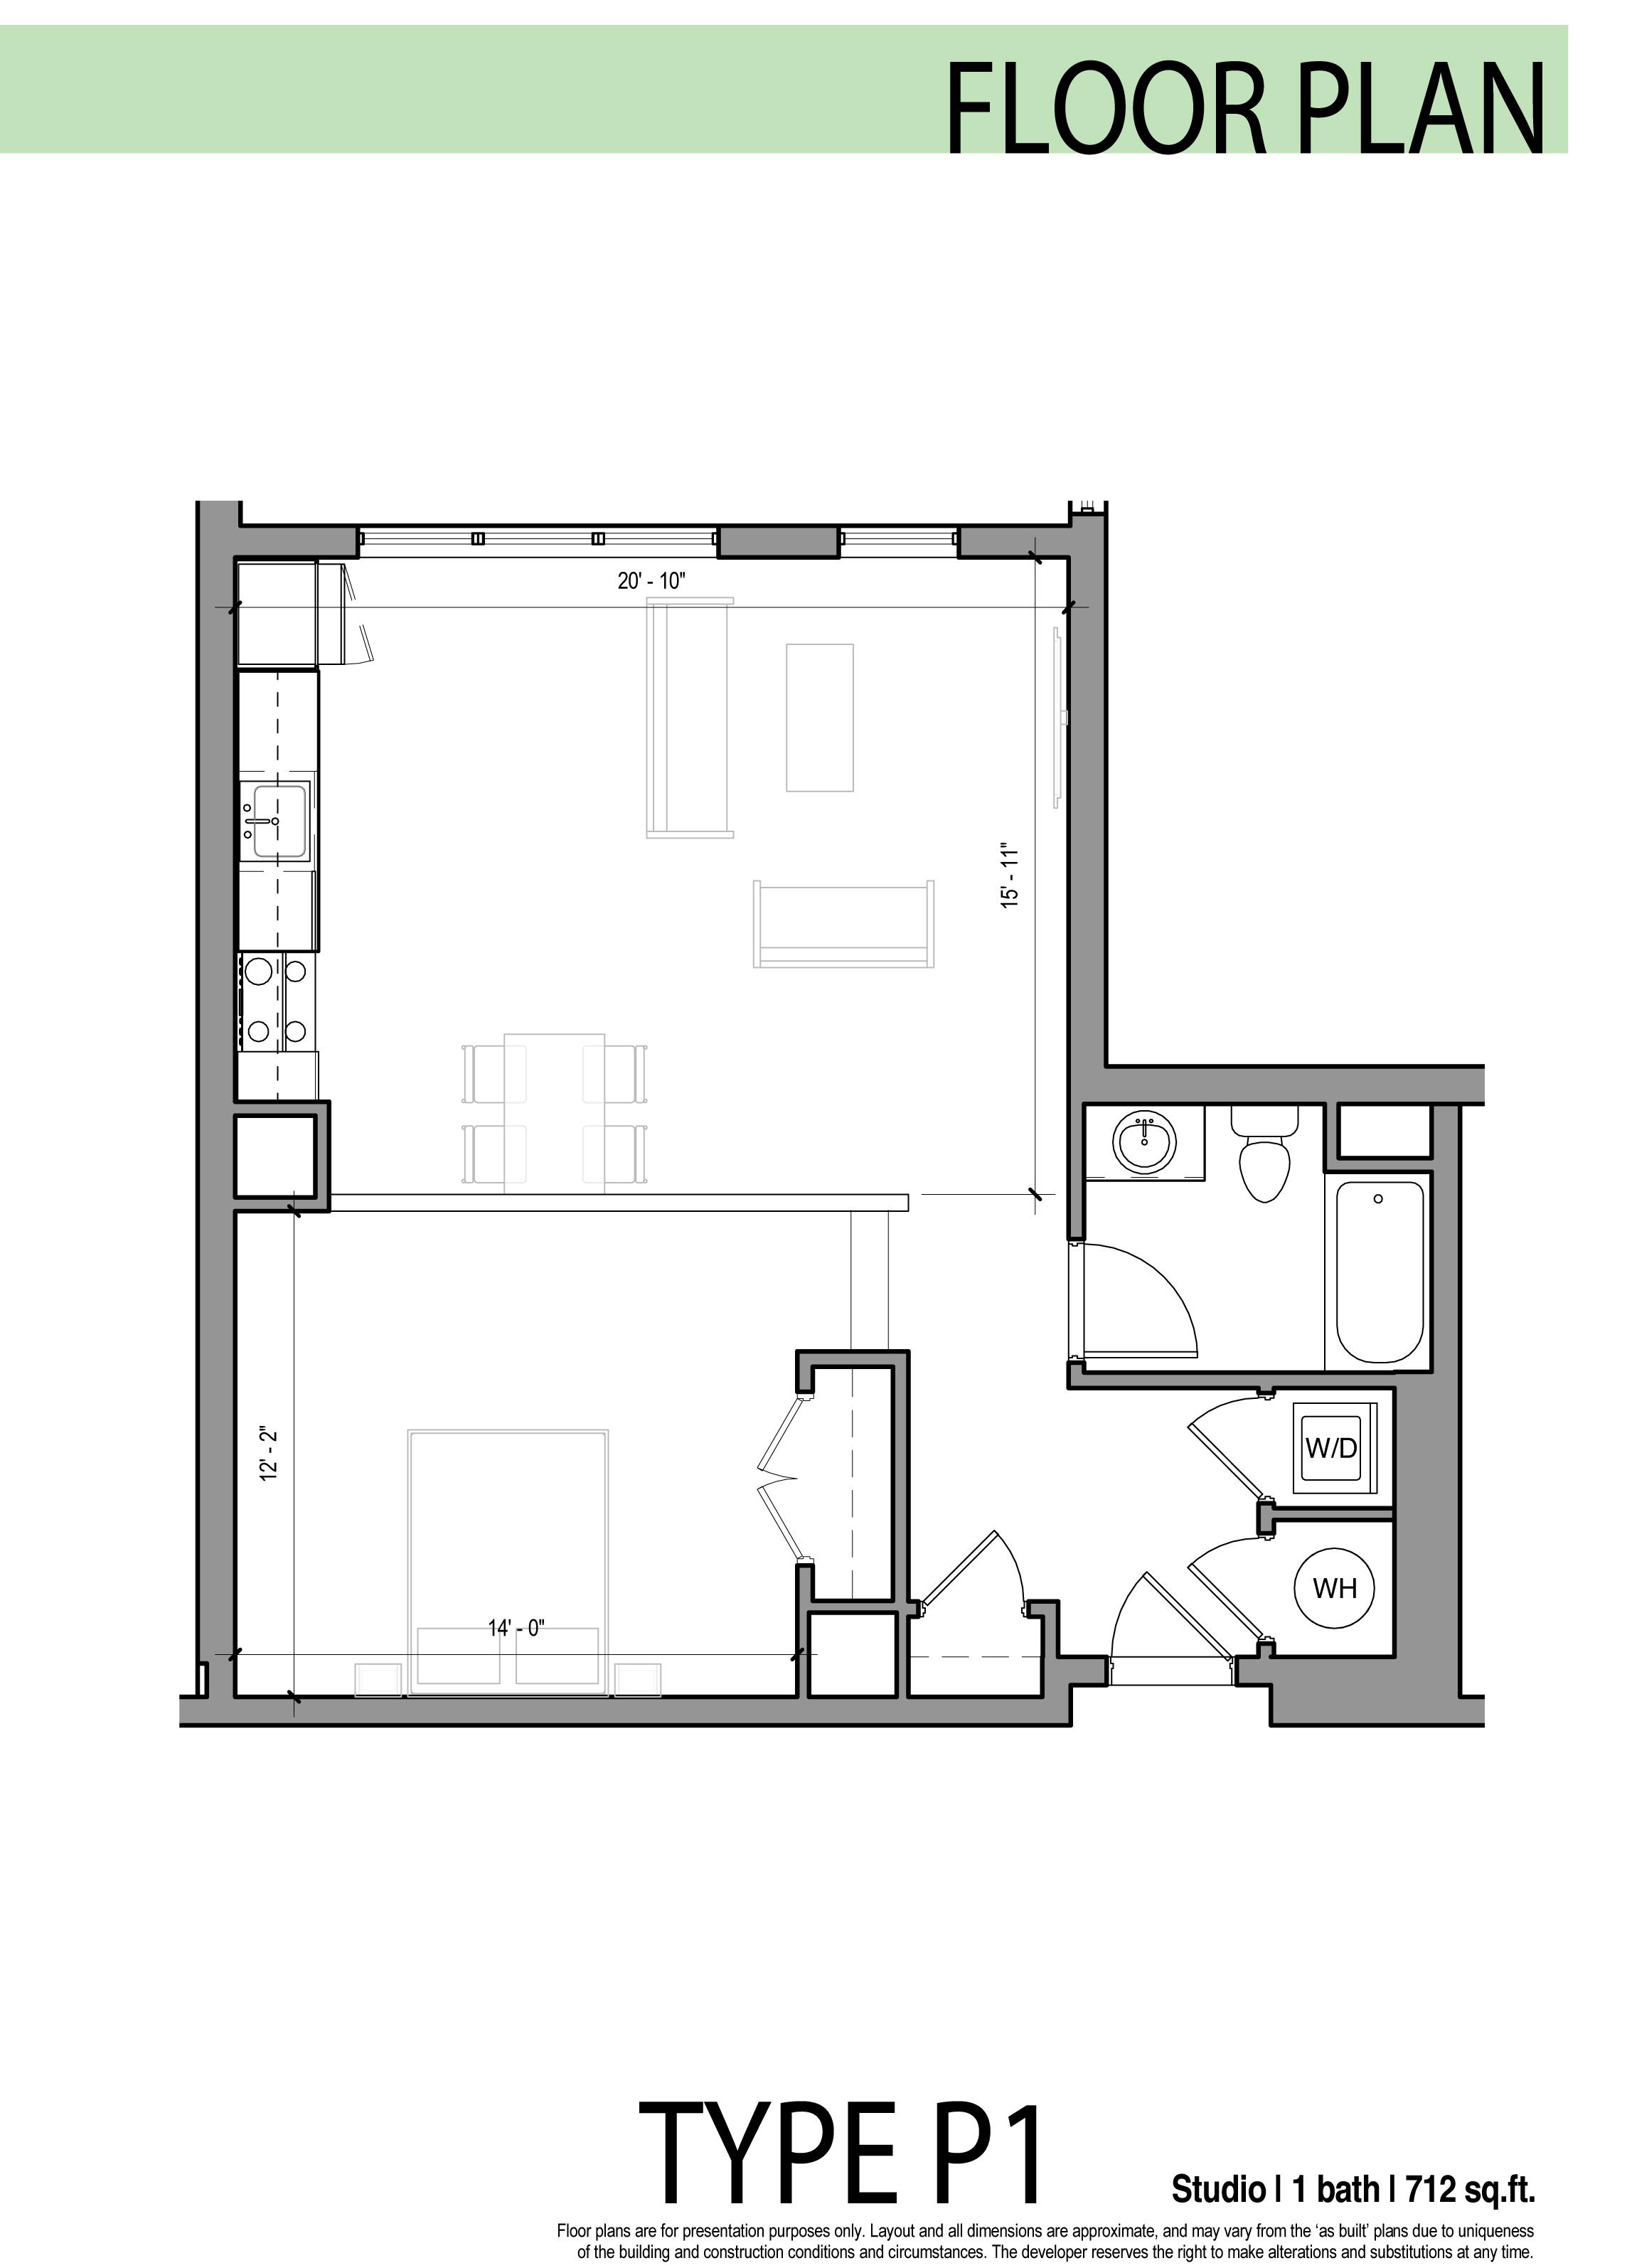 Edge allston floor plans layouts at the edge luxury building for Floorplan or floor plan